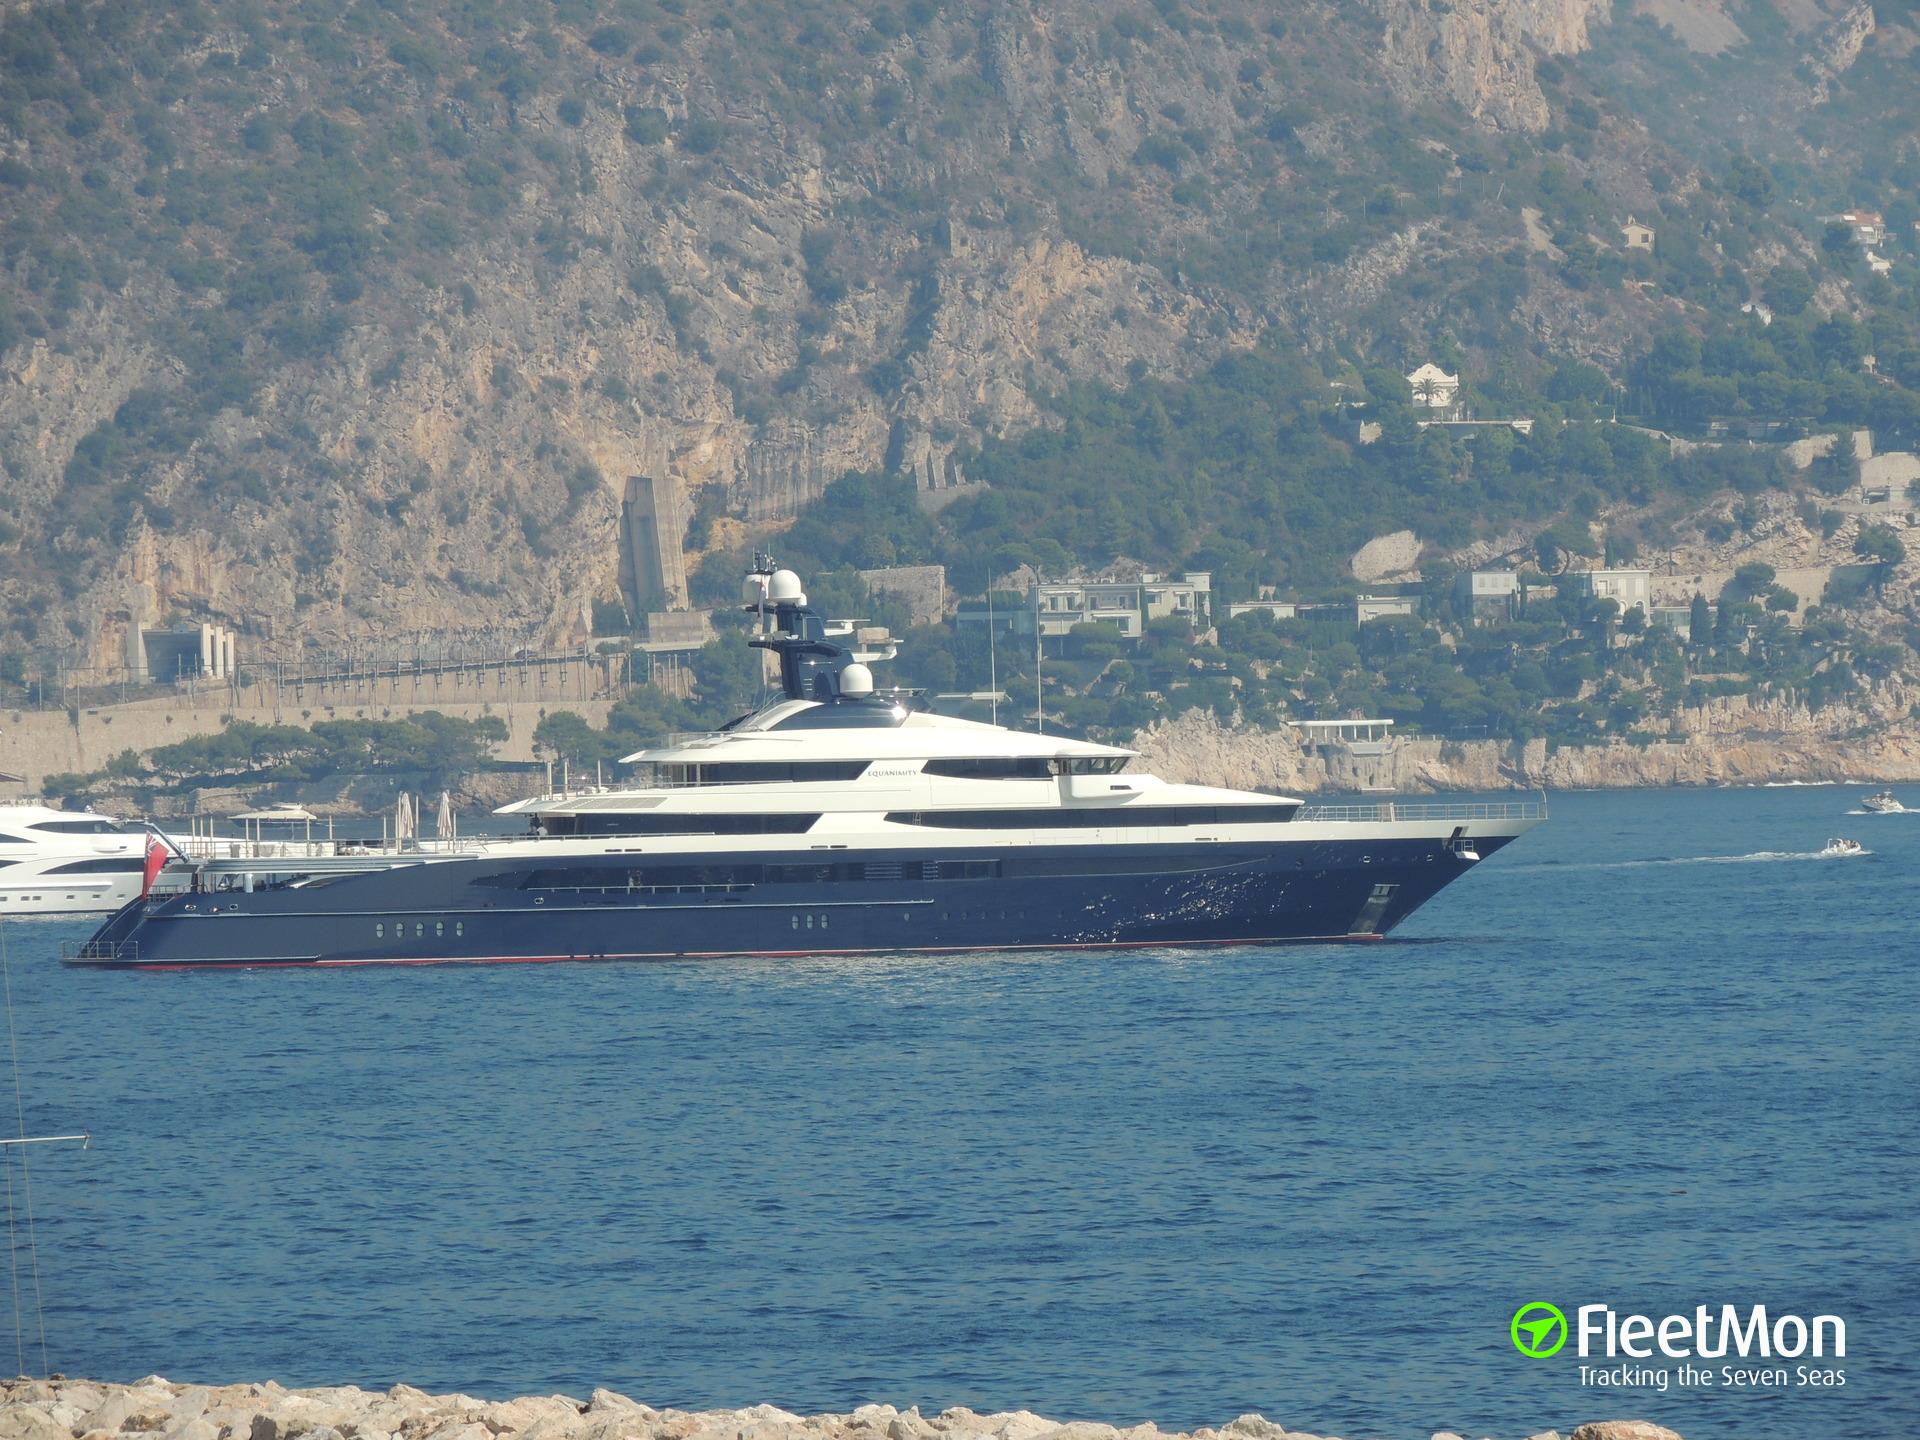 Mega yacht seized, Bali